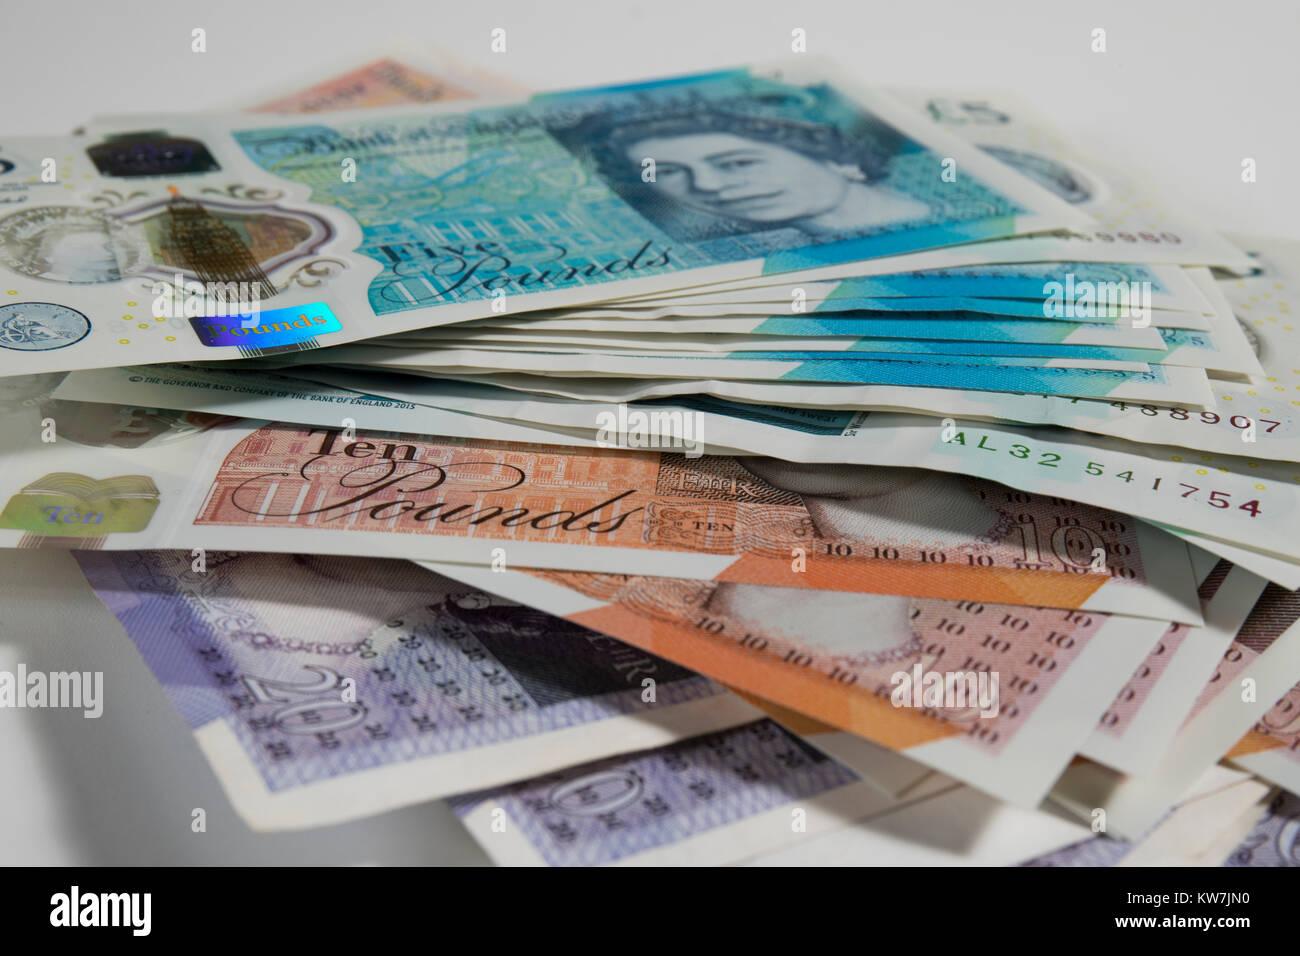 5, 10 and 20 Pound notes randomly arranged. - Stock Image